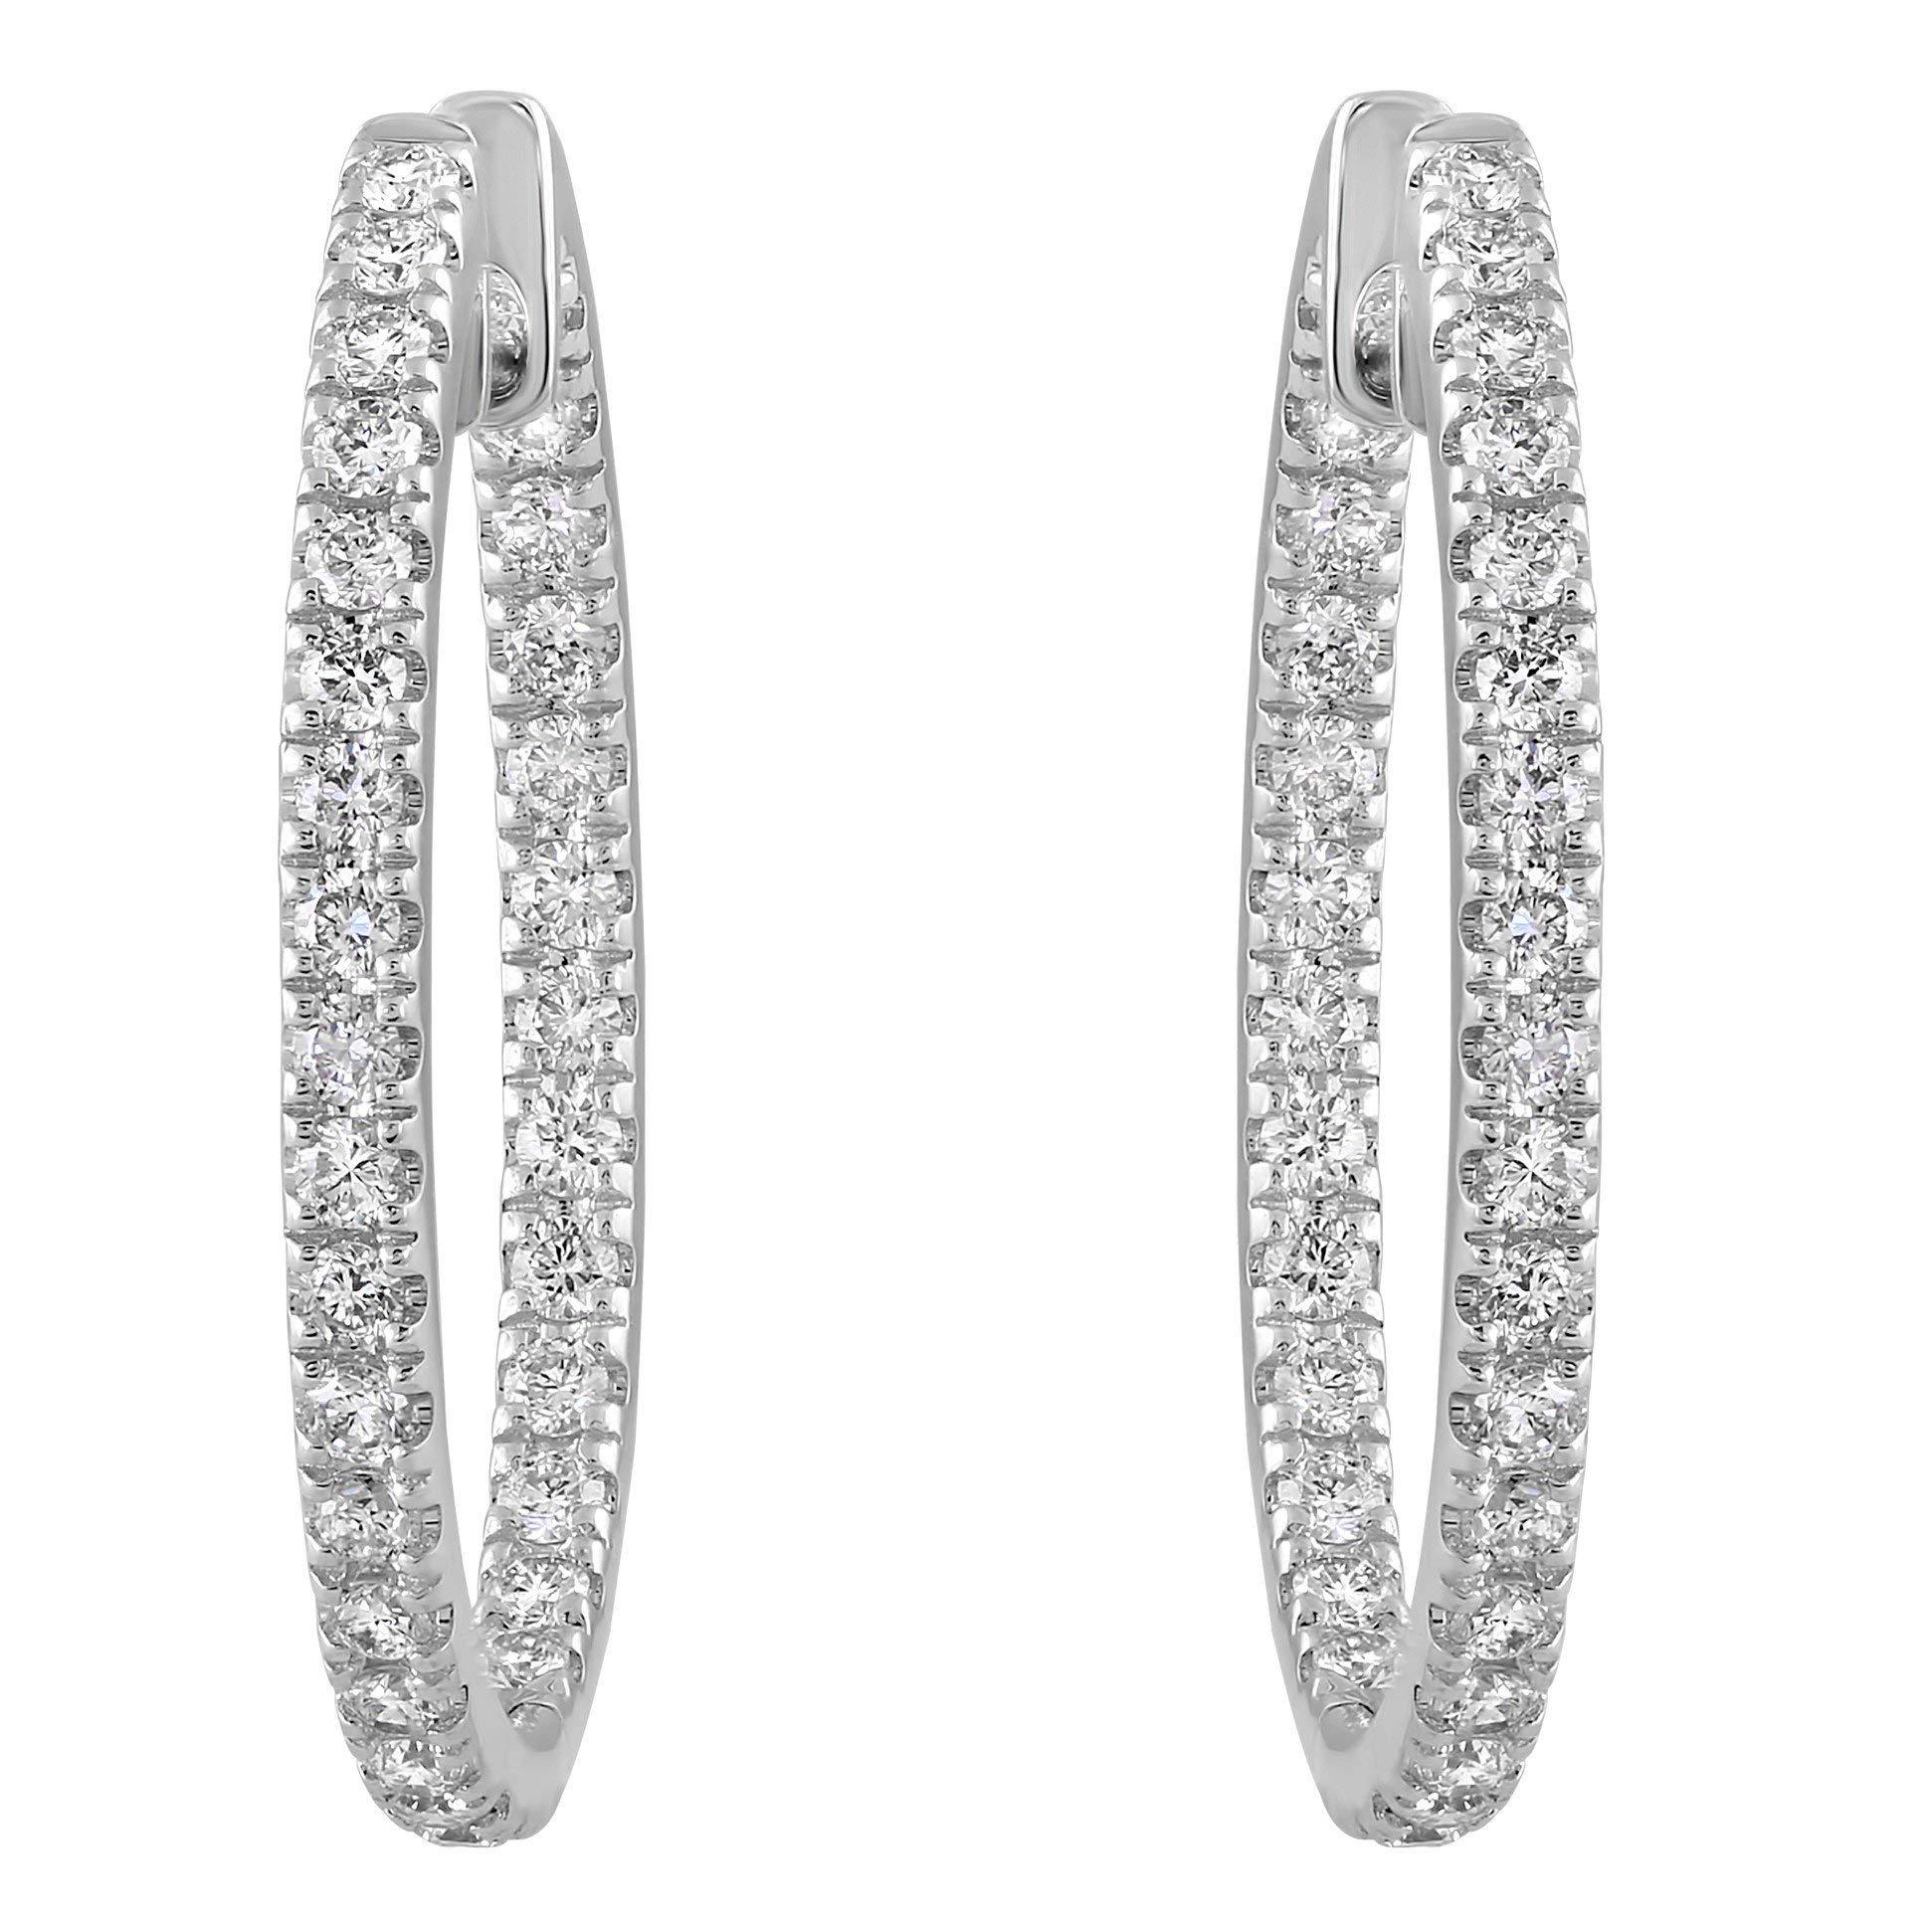 Olivia Paris 14k White Gold 1 Carat cttw Round Brilliant Diamond Hoop Earrings (H-I, SI2-I1) 1'' Inch